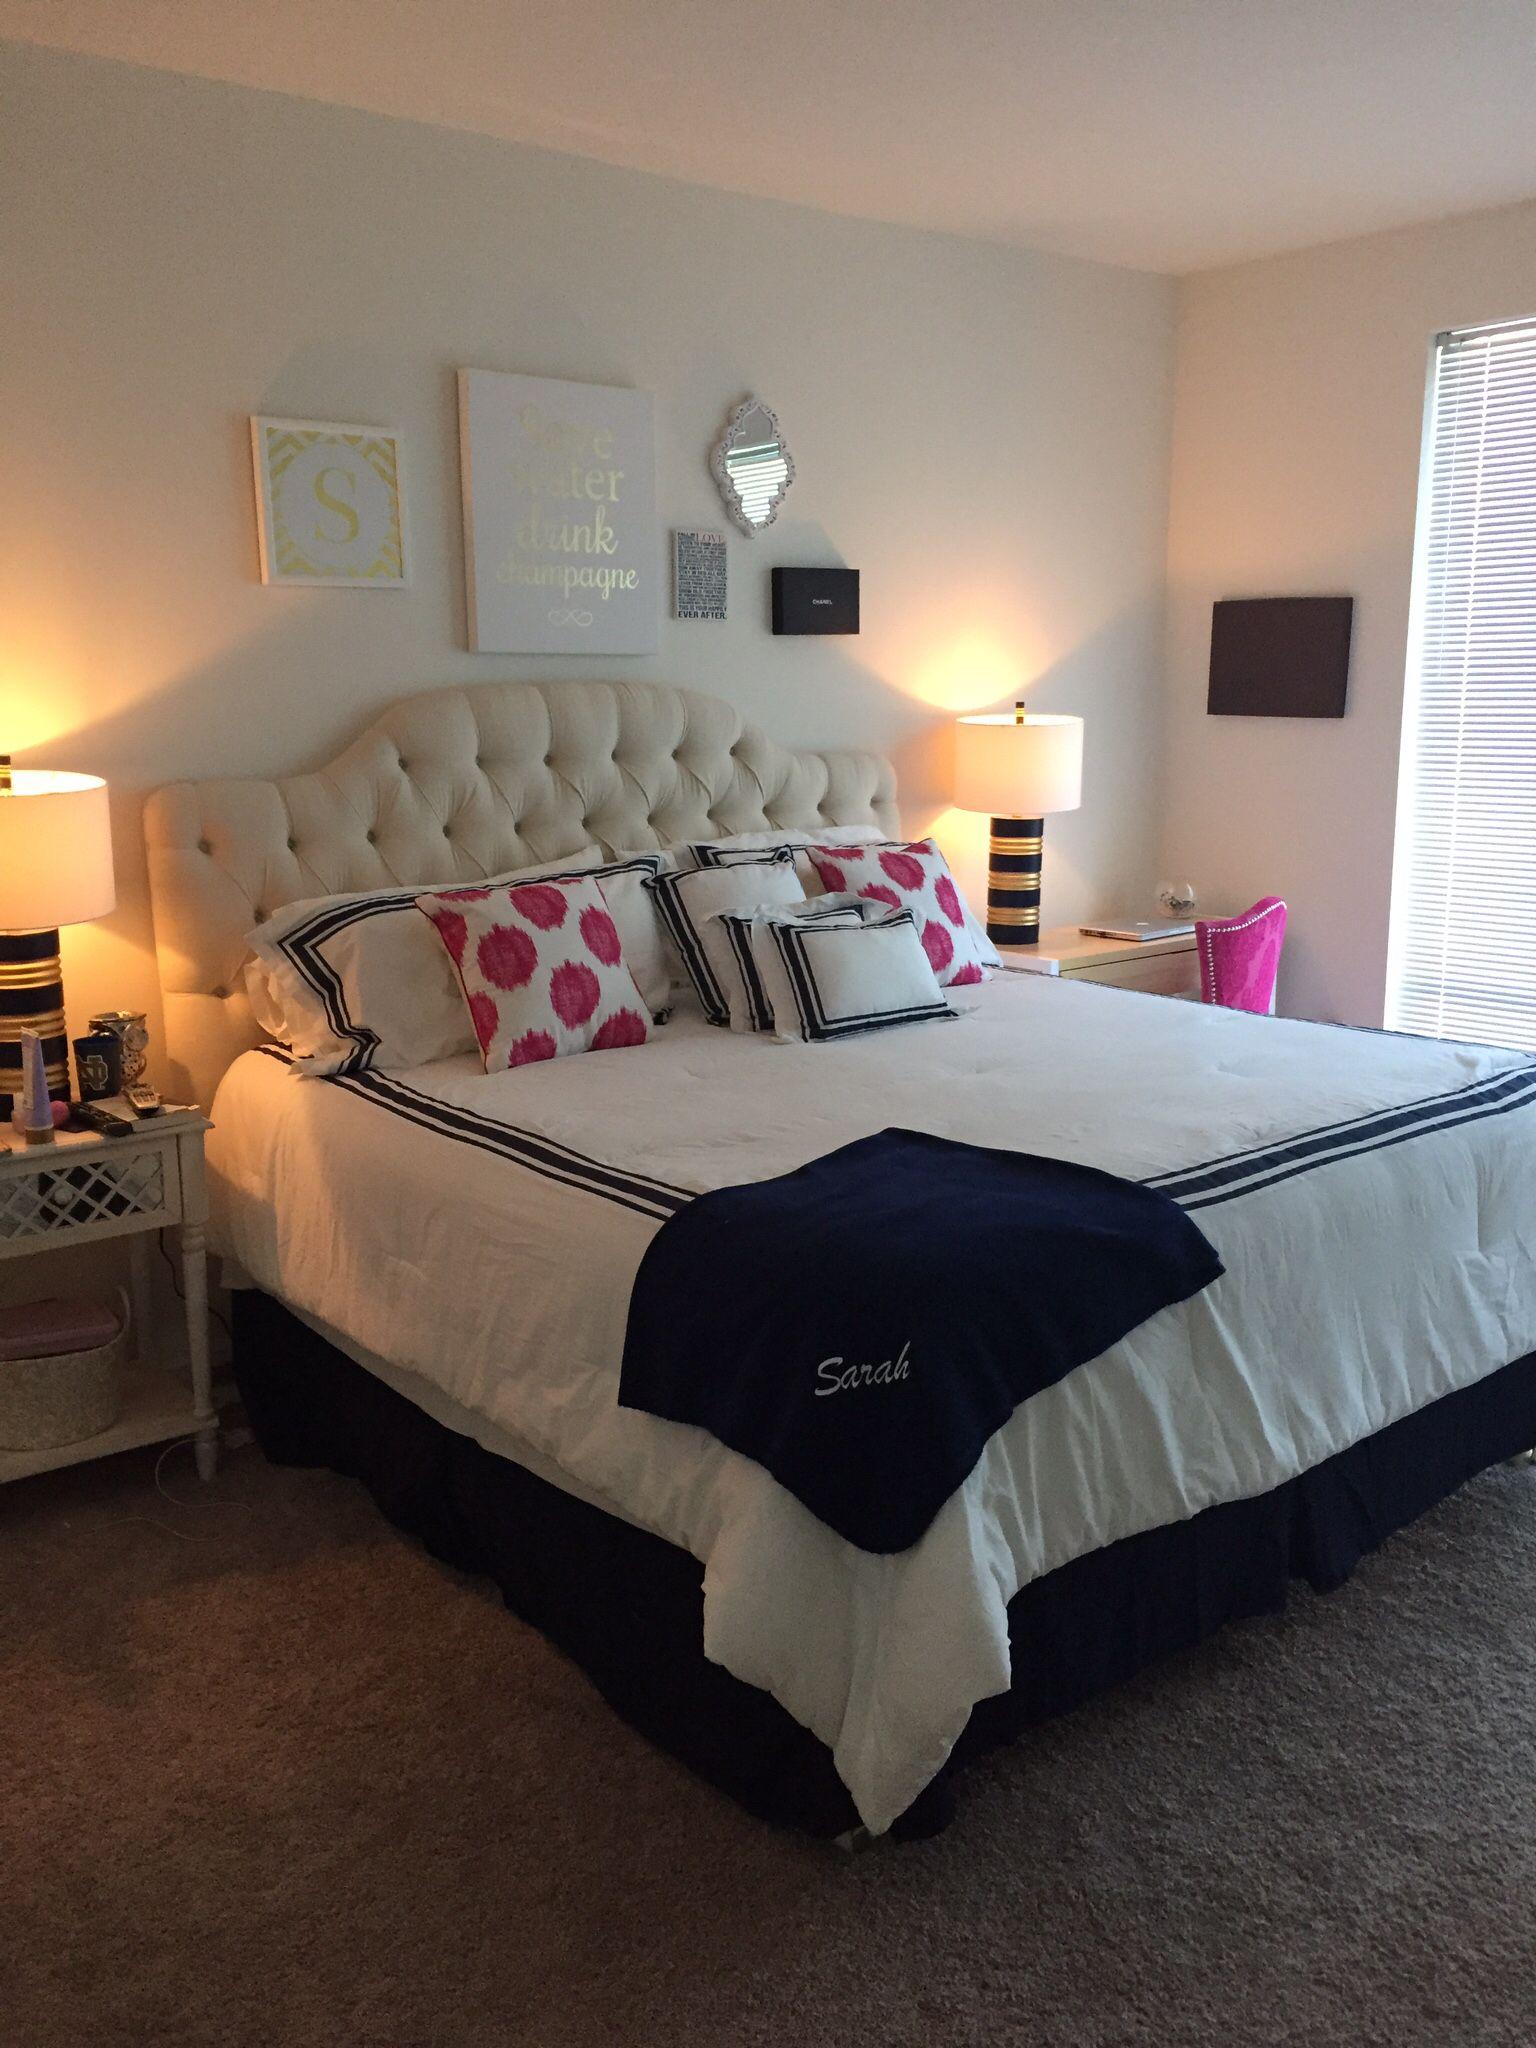 small apartment bedroom idea Twenty somethings first apartment bedroom. | MARGI VORDER